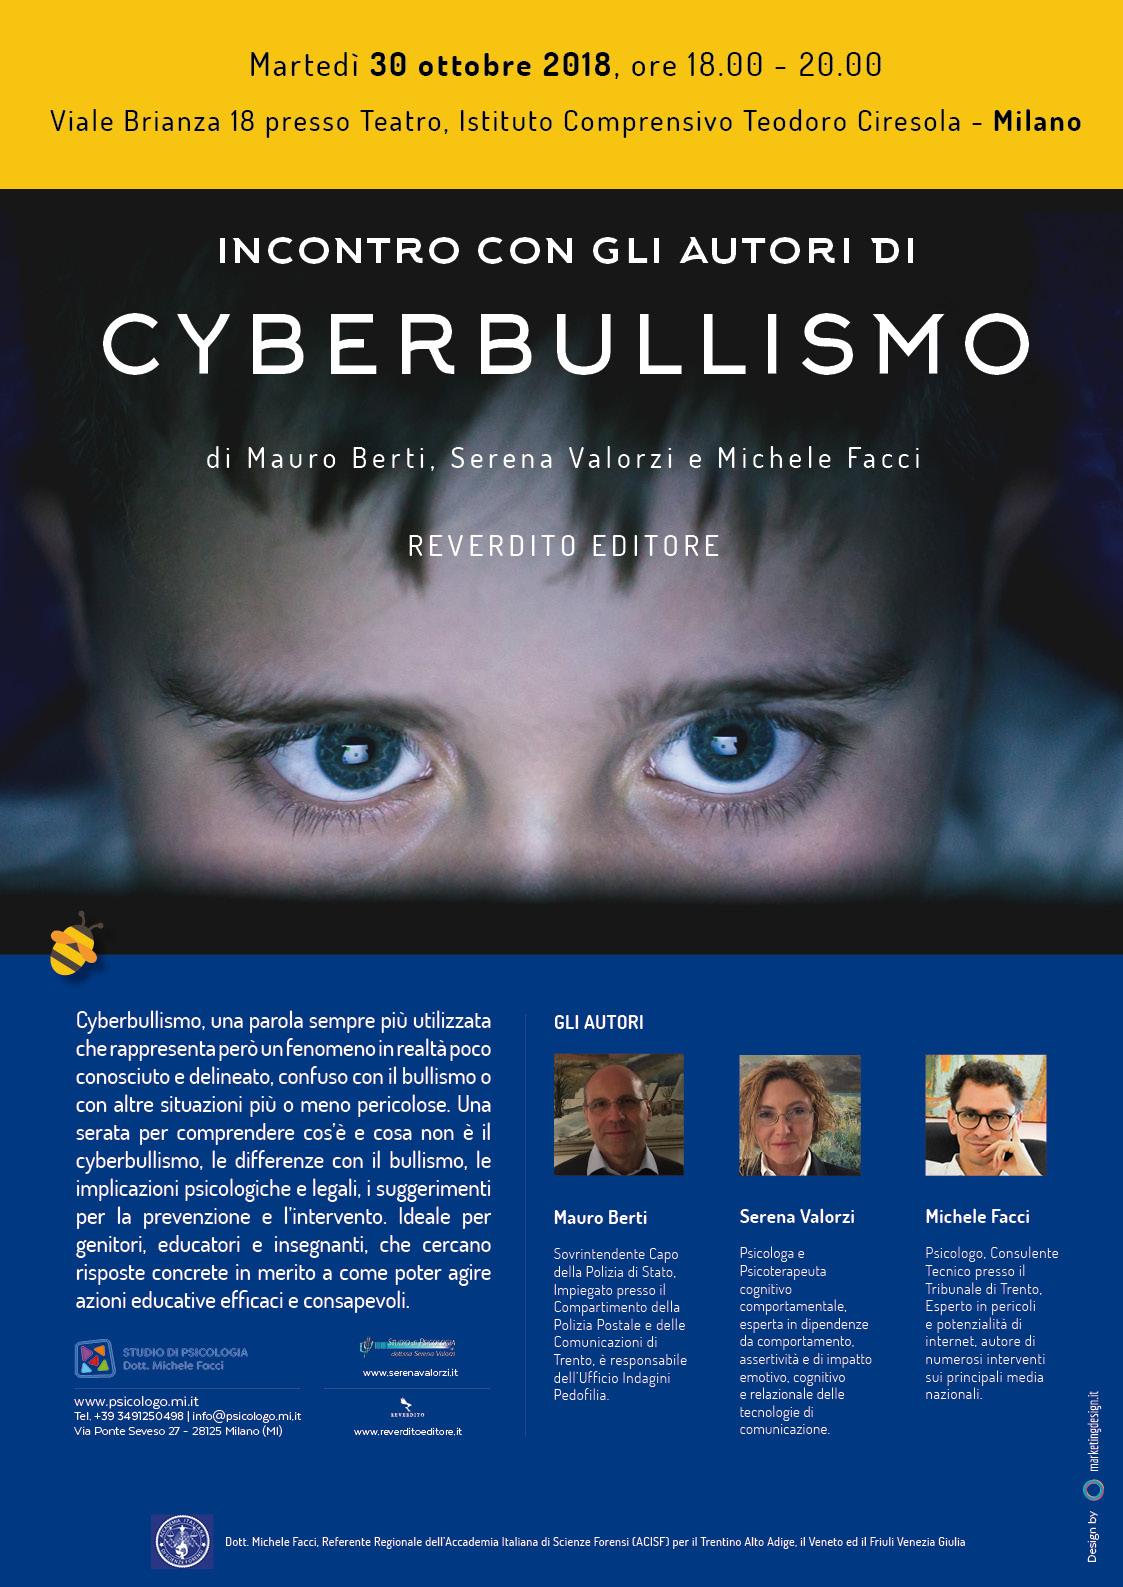 Cyberbullismo-Michele-Facci-Mauro-Berti-Serena-Valorzi